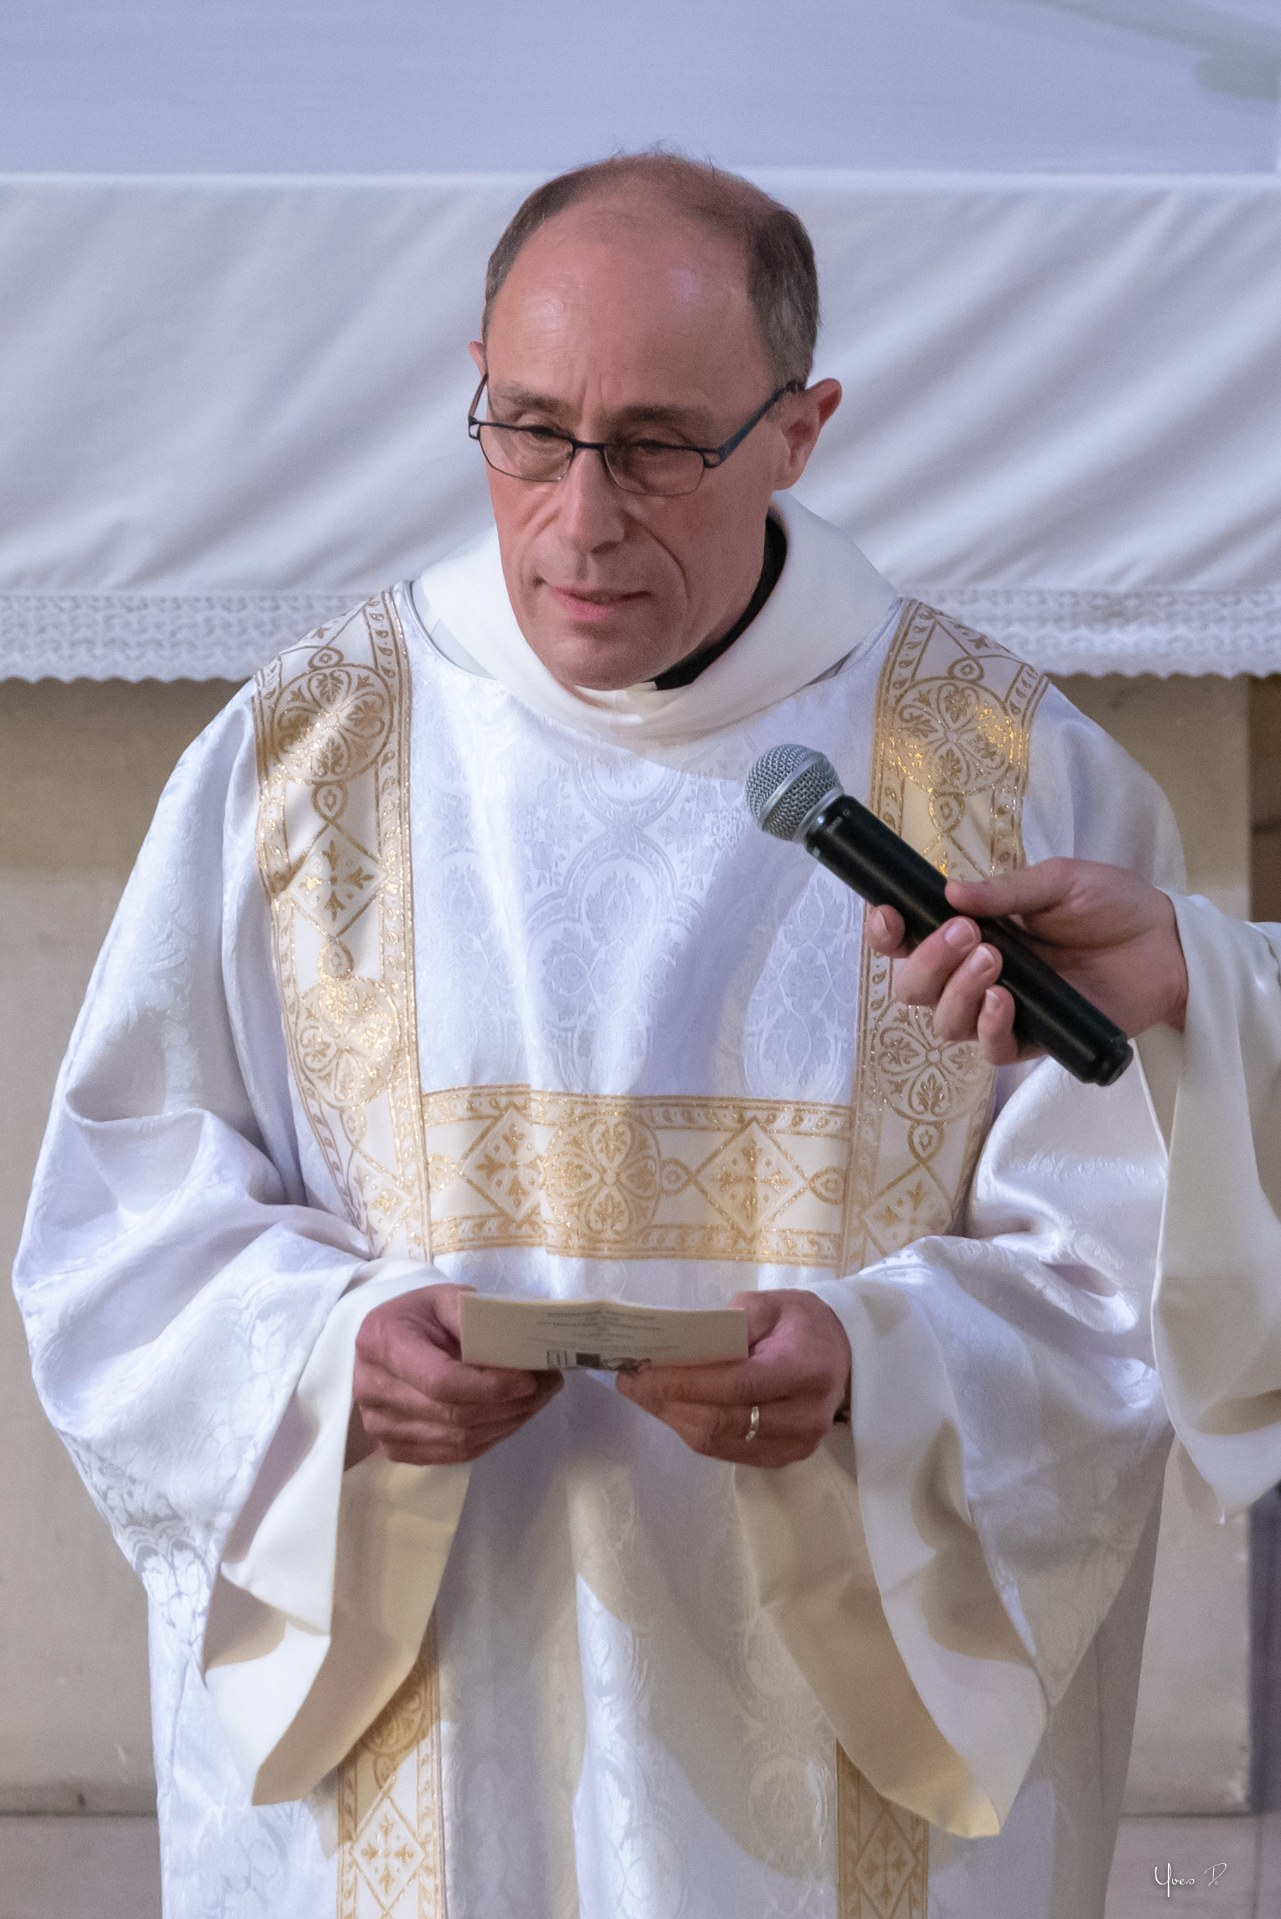 A14102018-Felice-Rossi-Ordination diaconale-65954